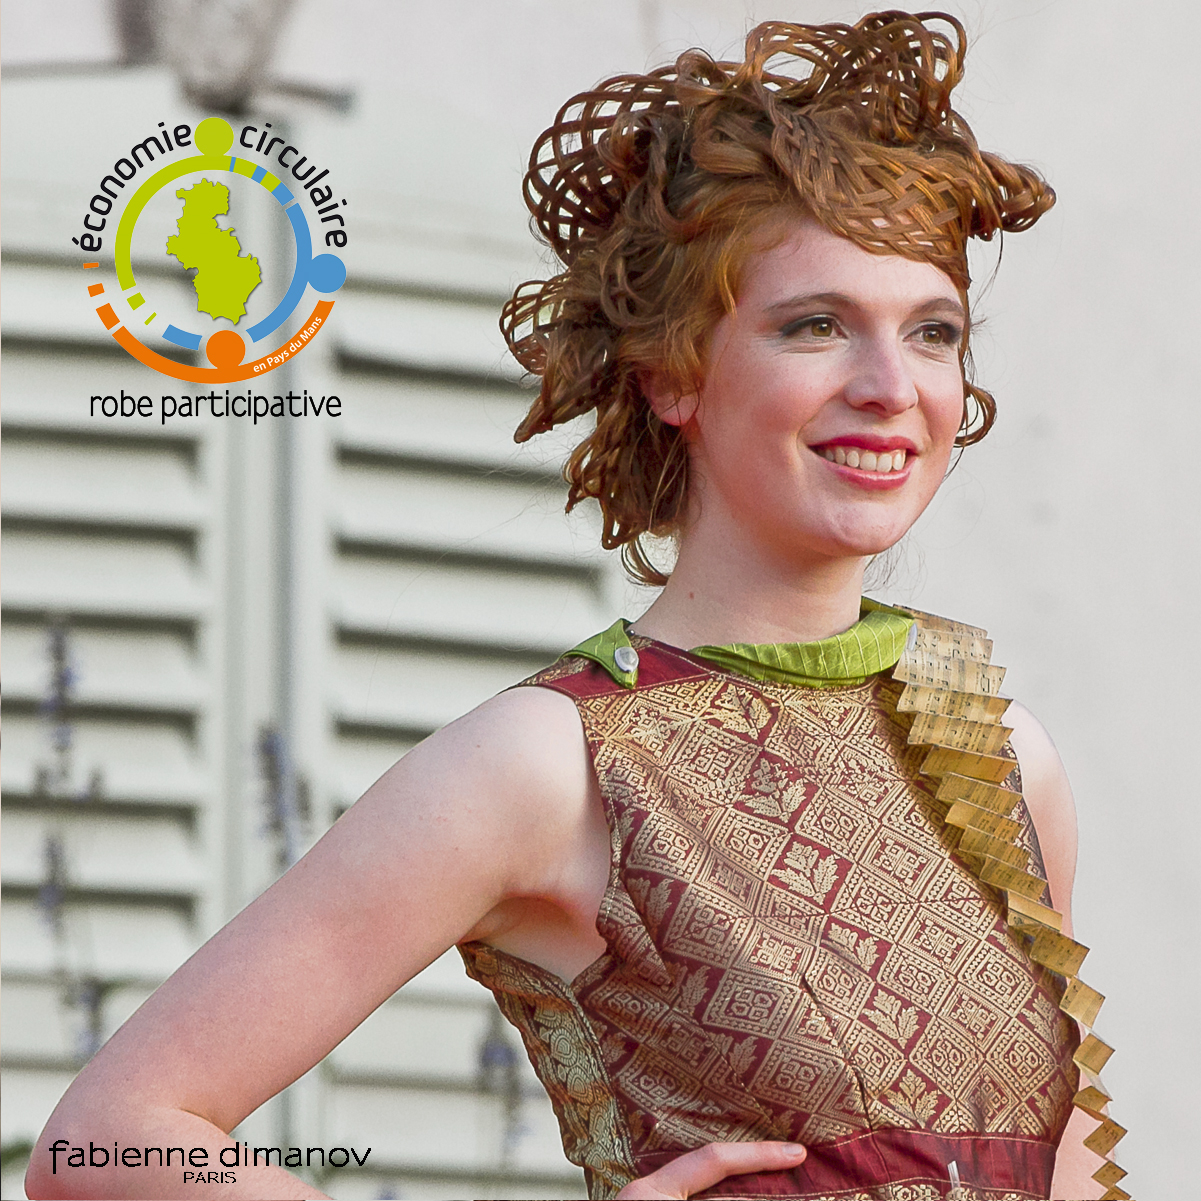 Gaia - robe participative - Fabienne dimanov Paris